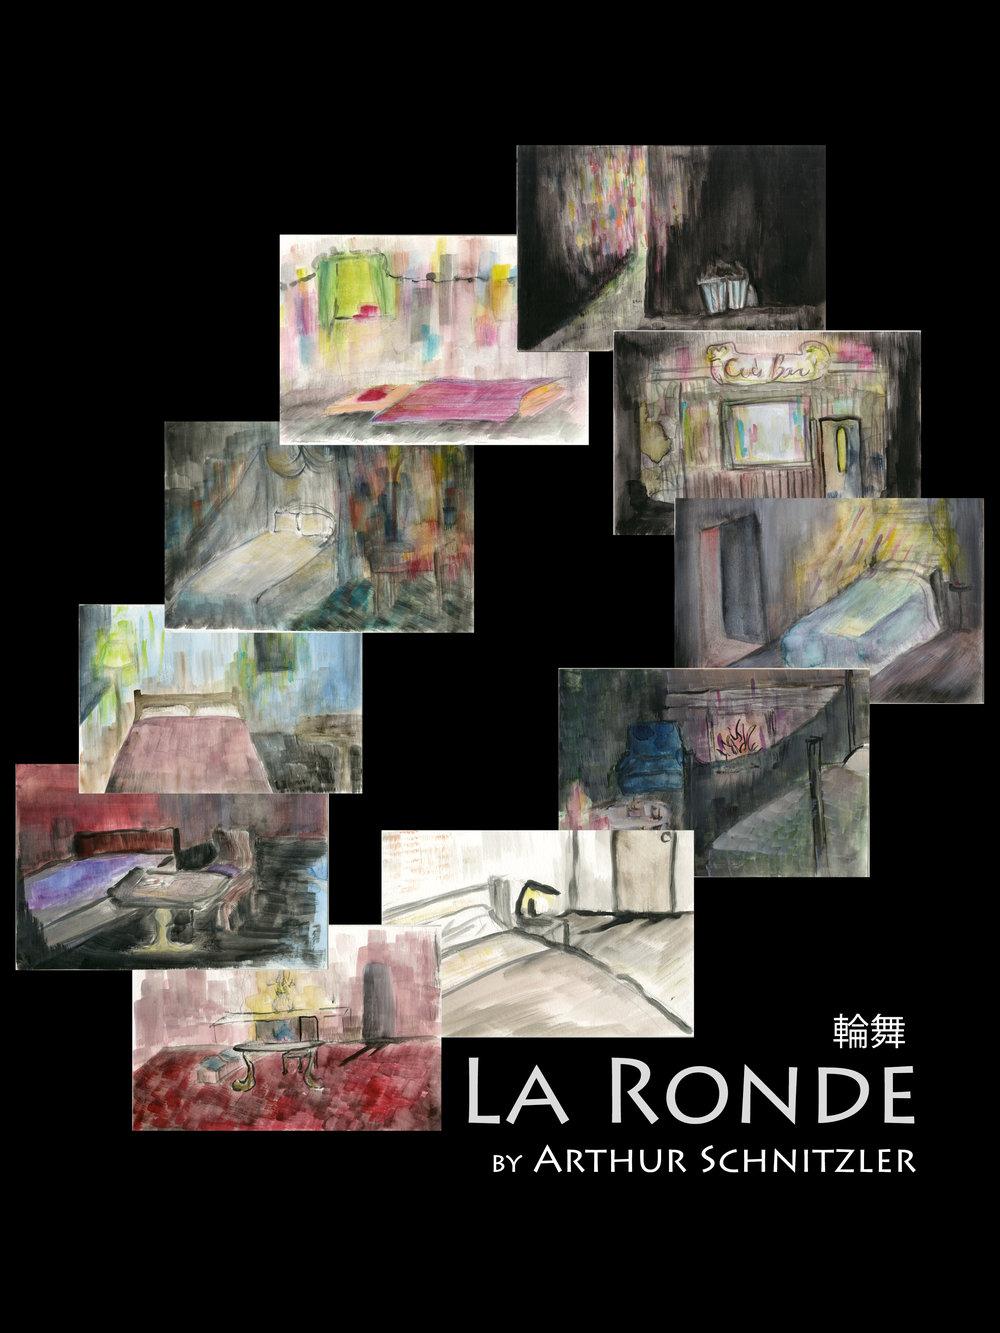 La Ronde  by Arthur Schnitzler Setting in the present in Yokosuka, Japan. Unproduced.